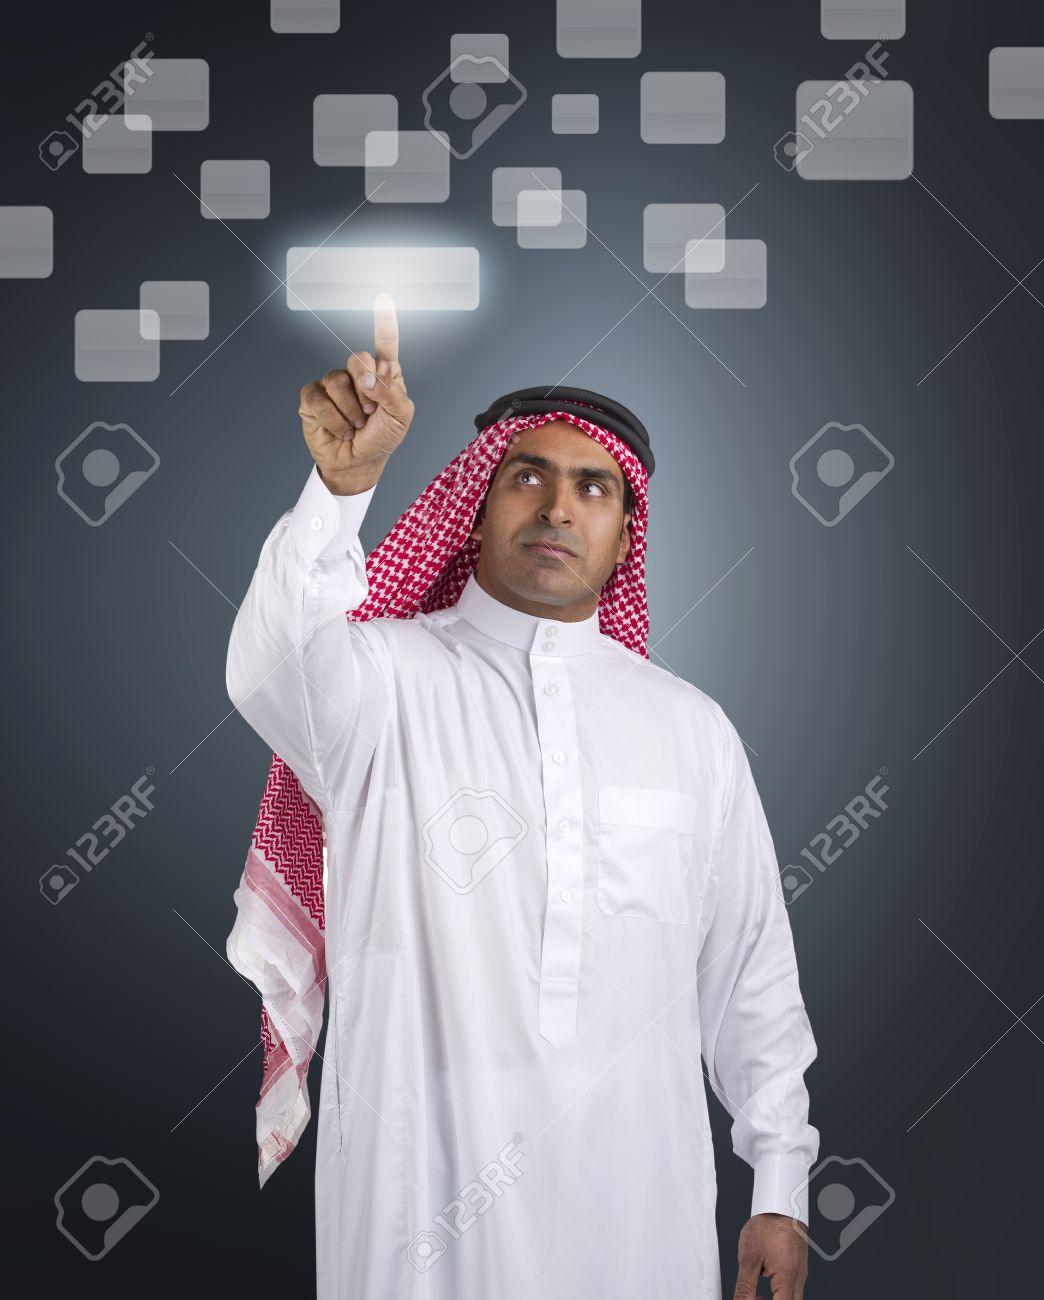 arabian businessman pressing a touchscreen button Stock Photo - 13659188